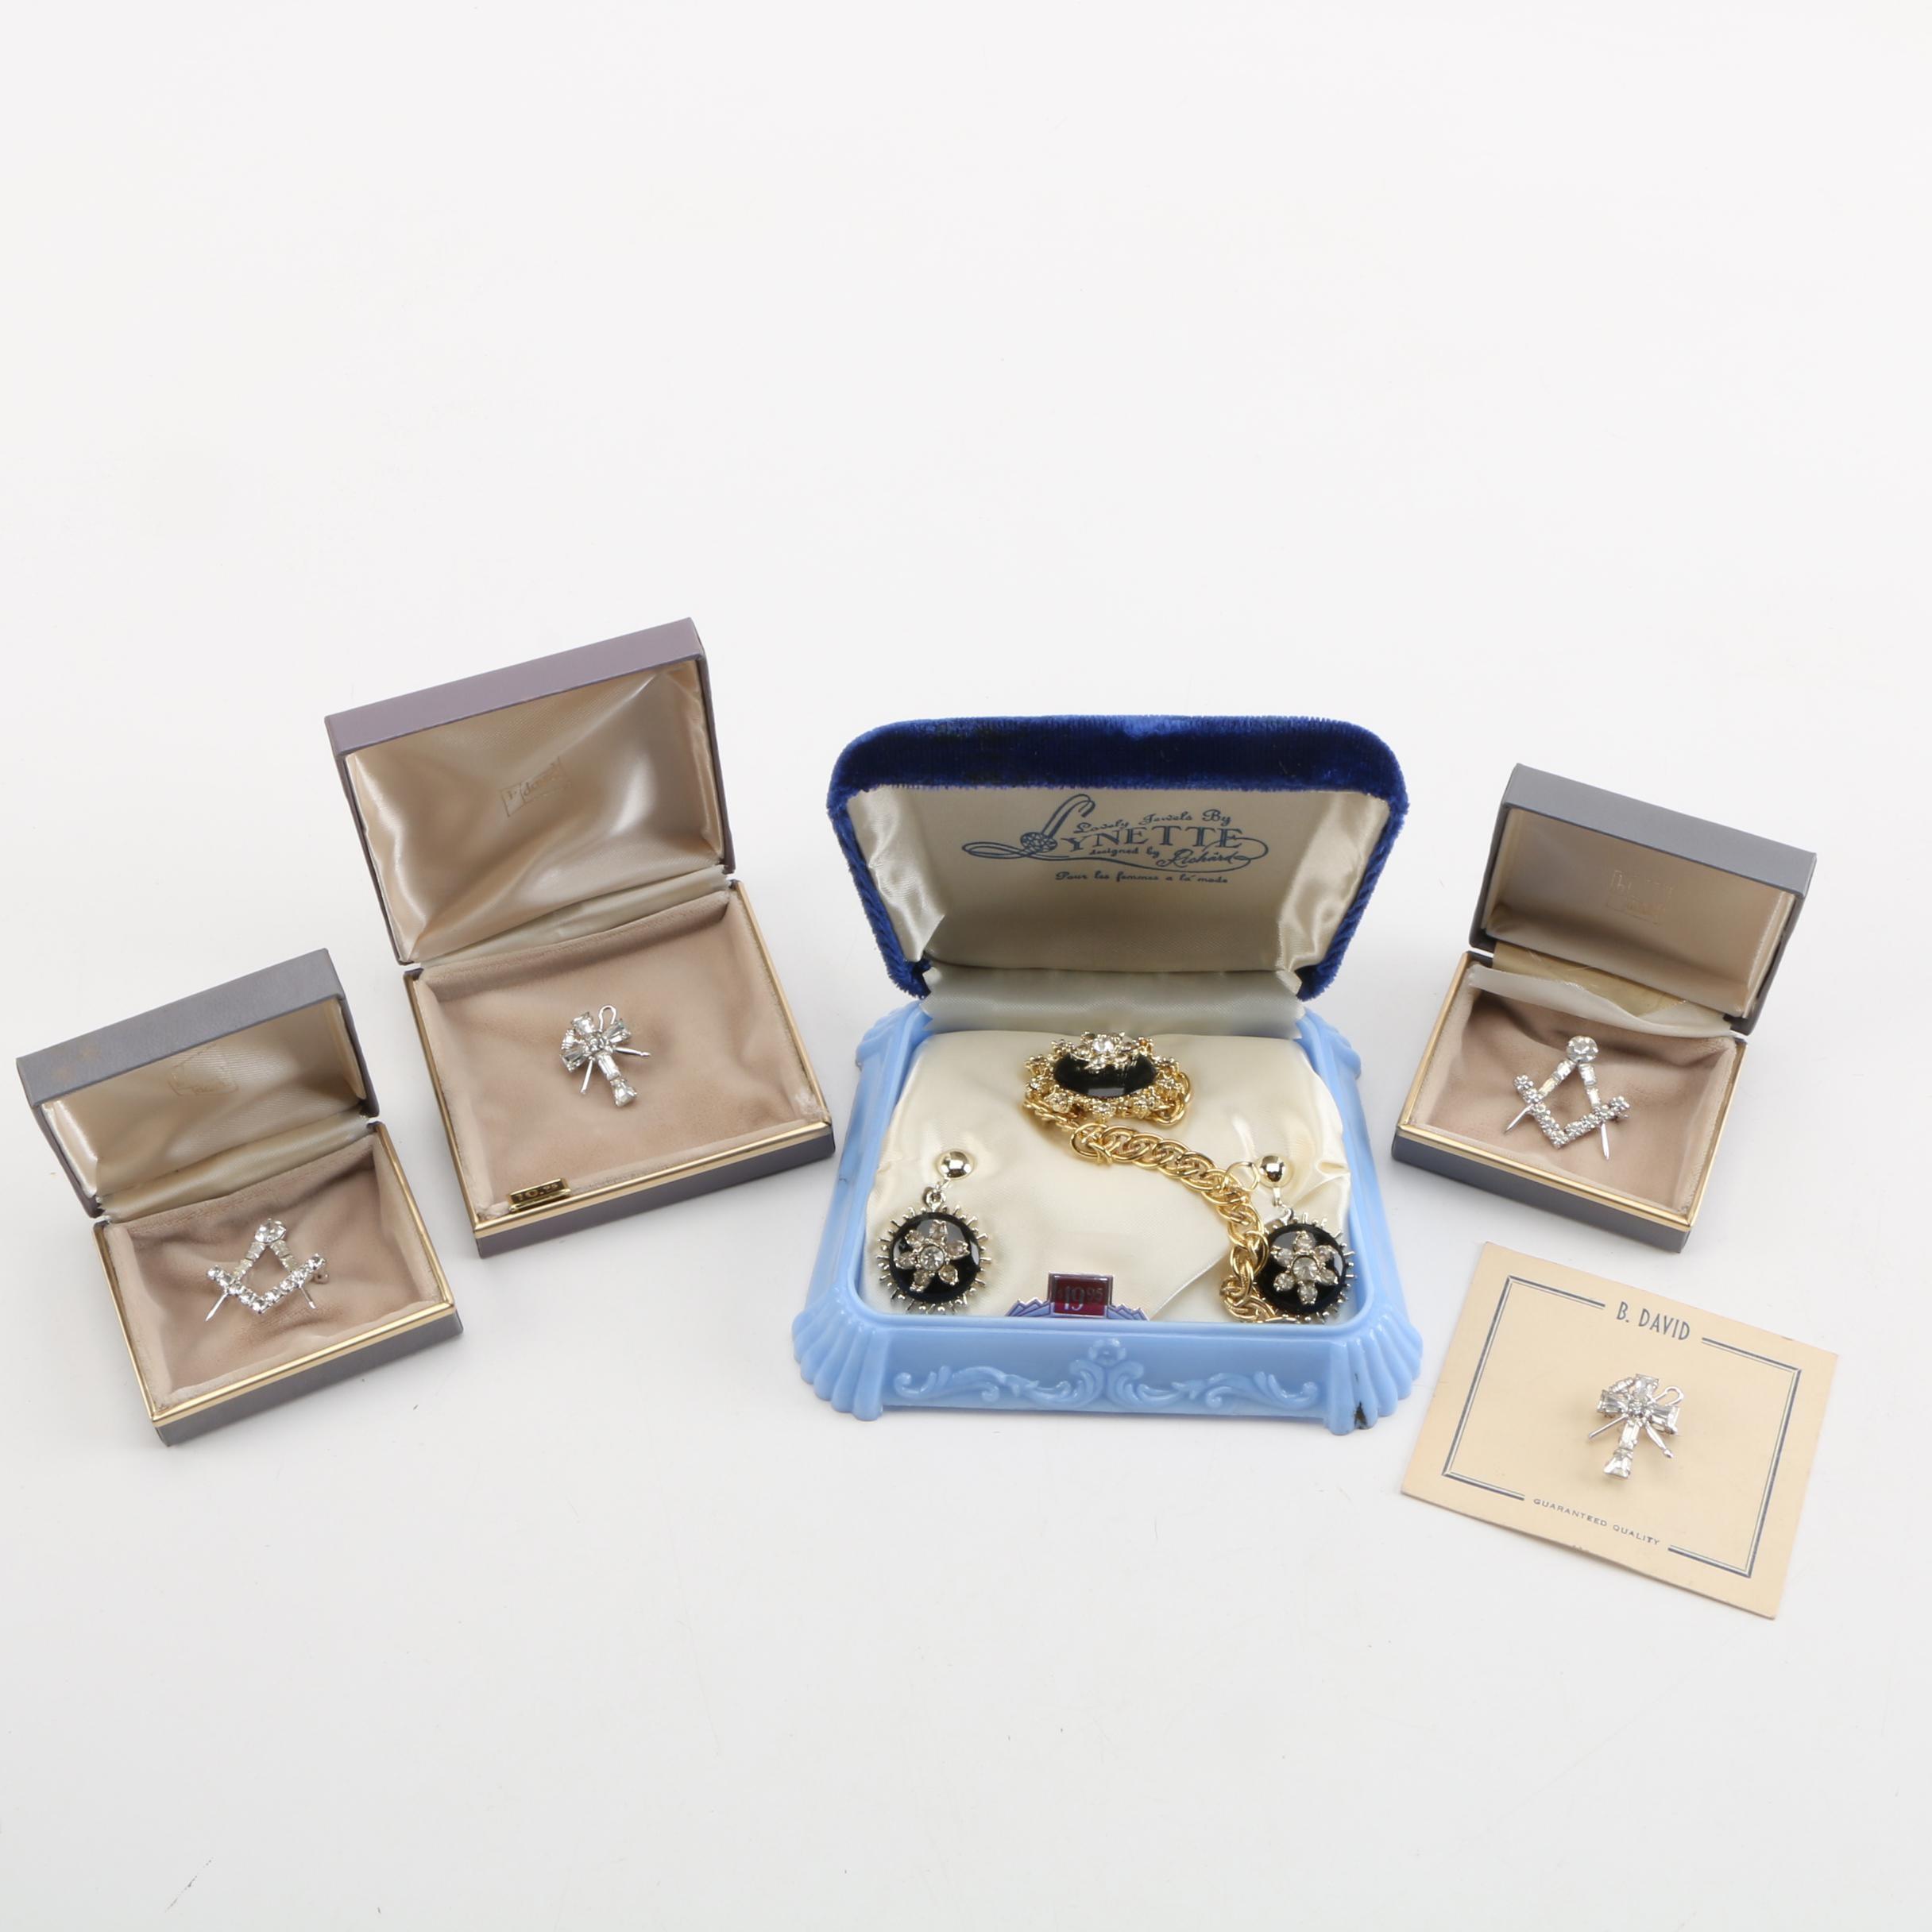 Assorted Decorative Pins